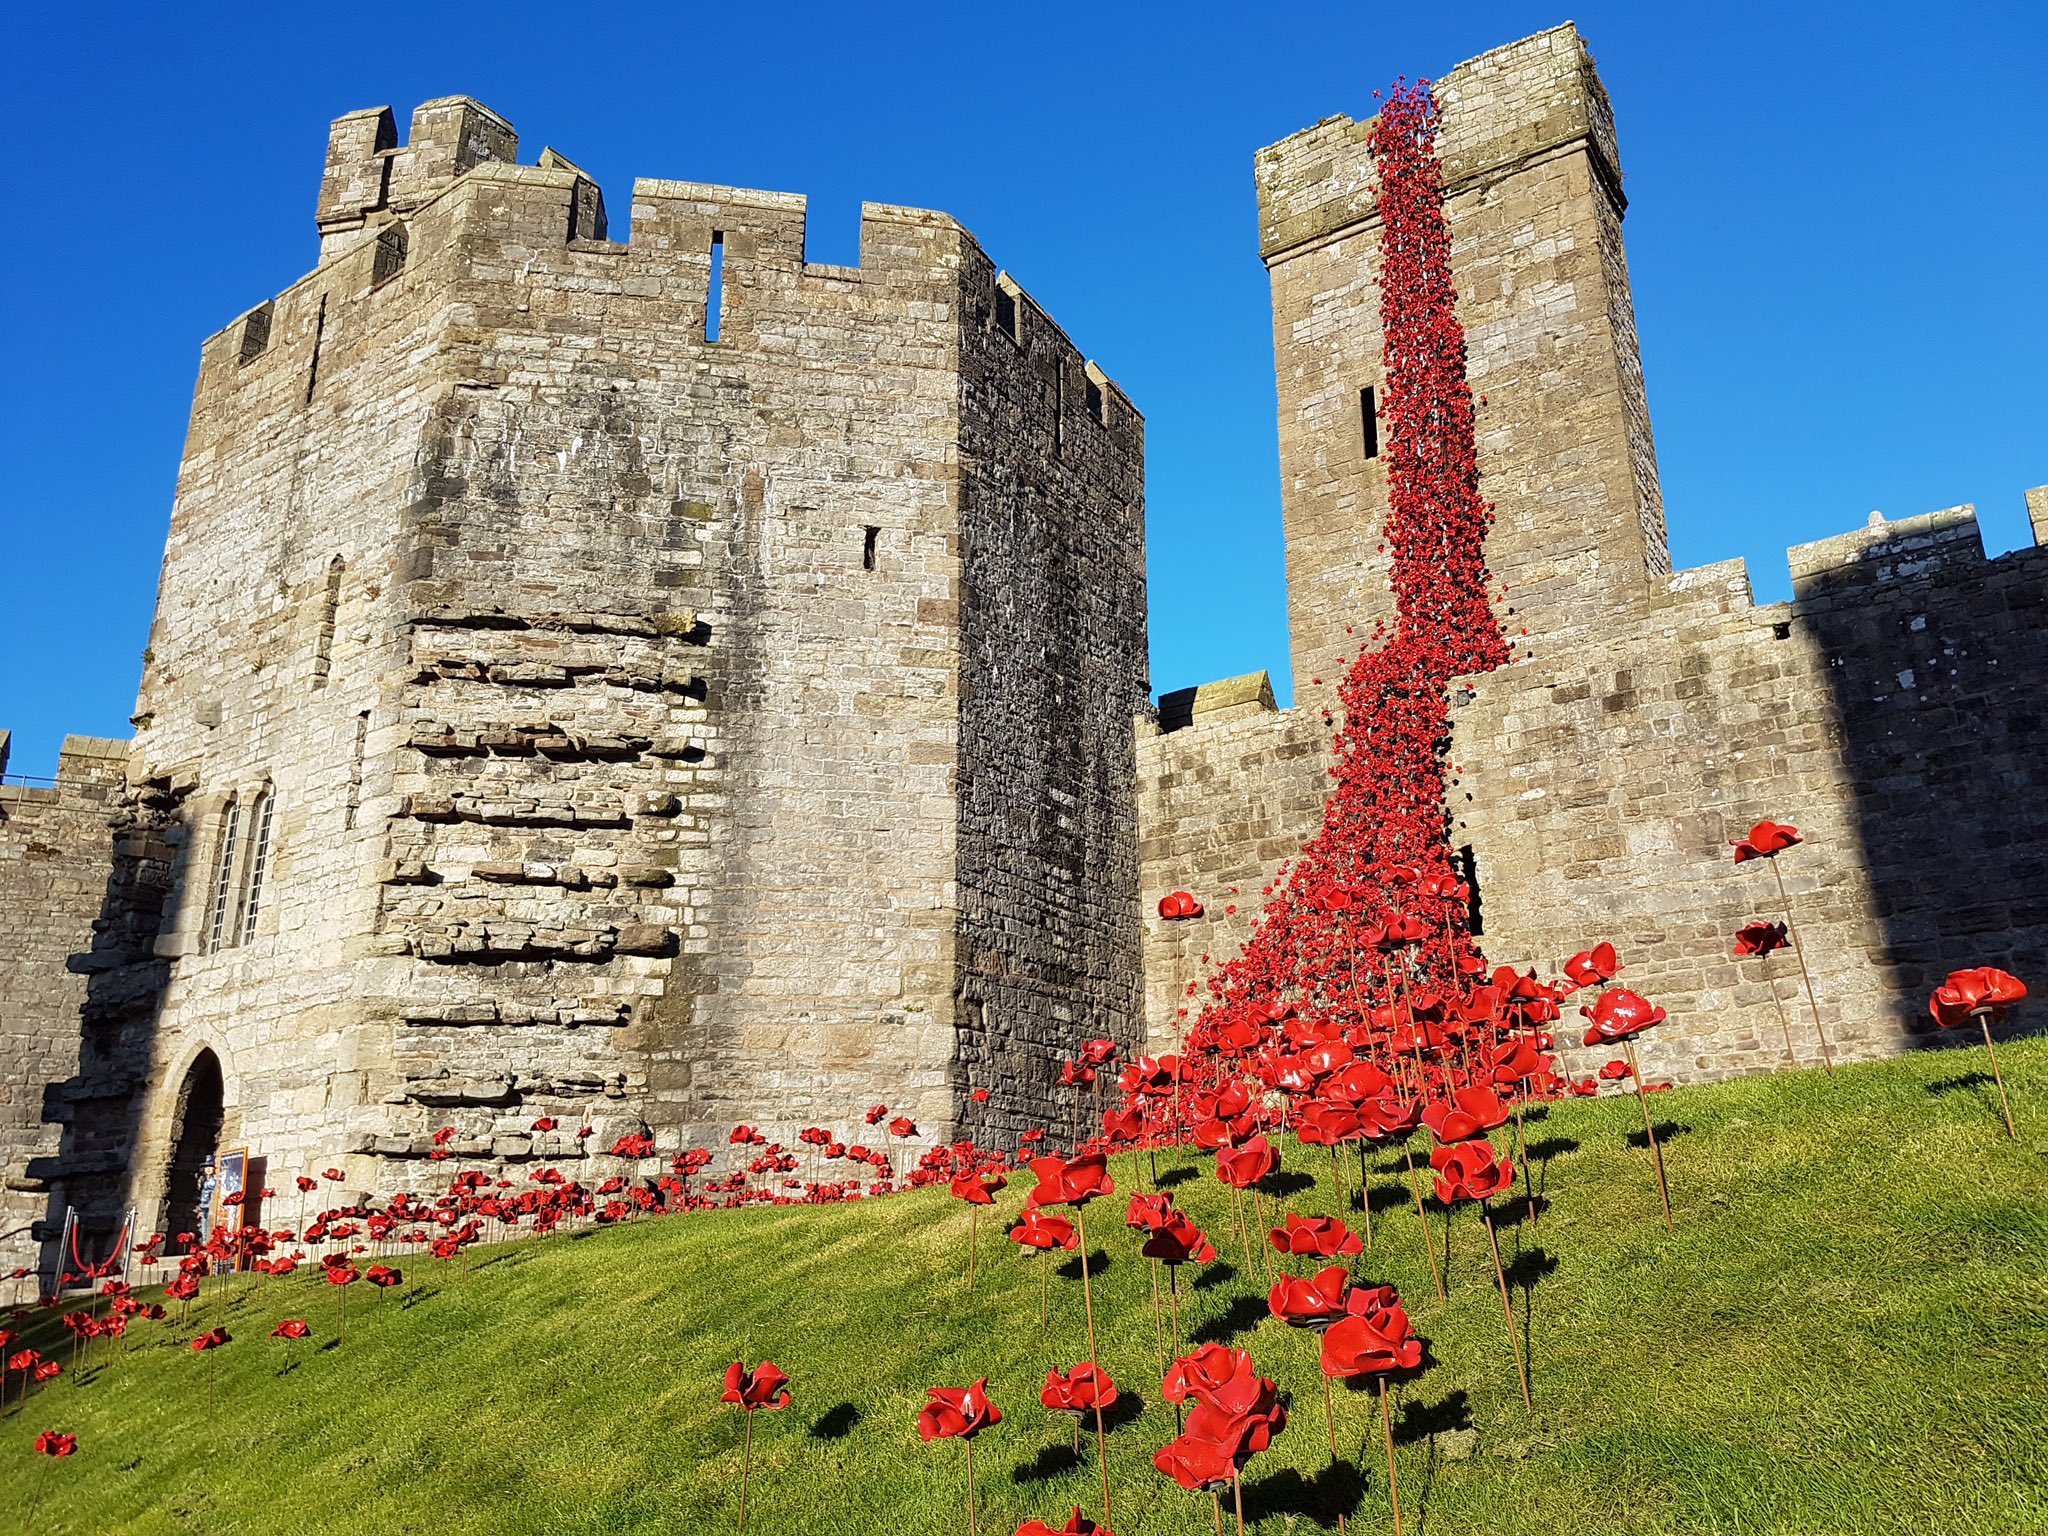 Poppies: Weeping Window